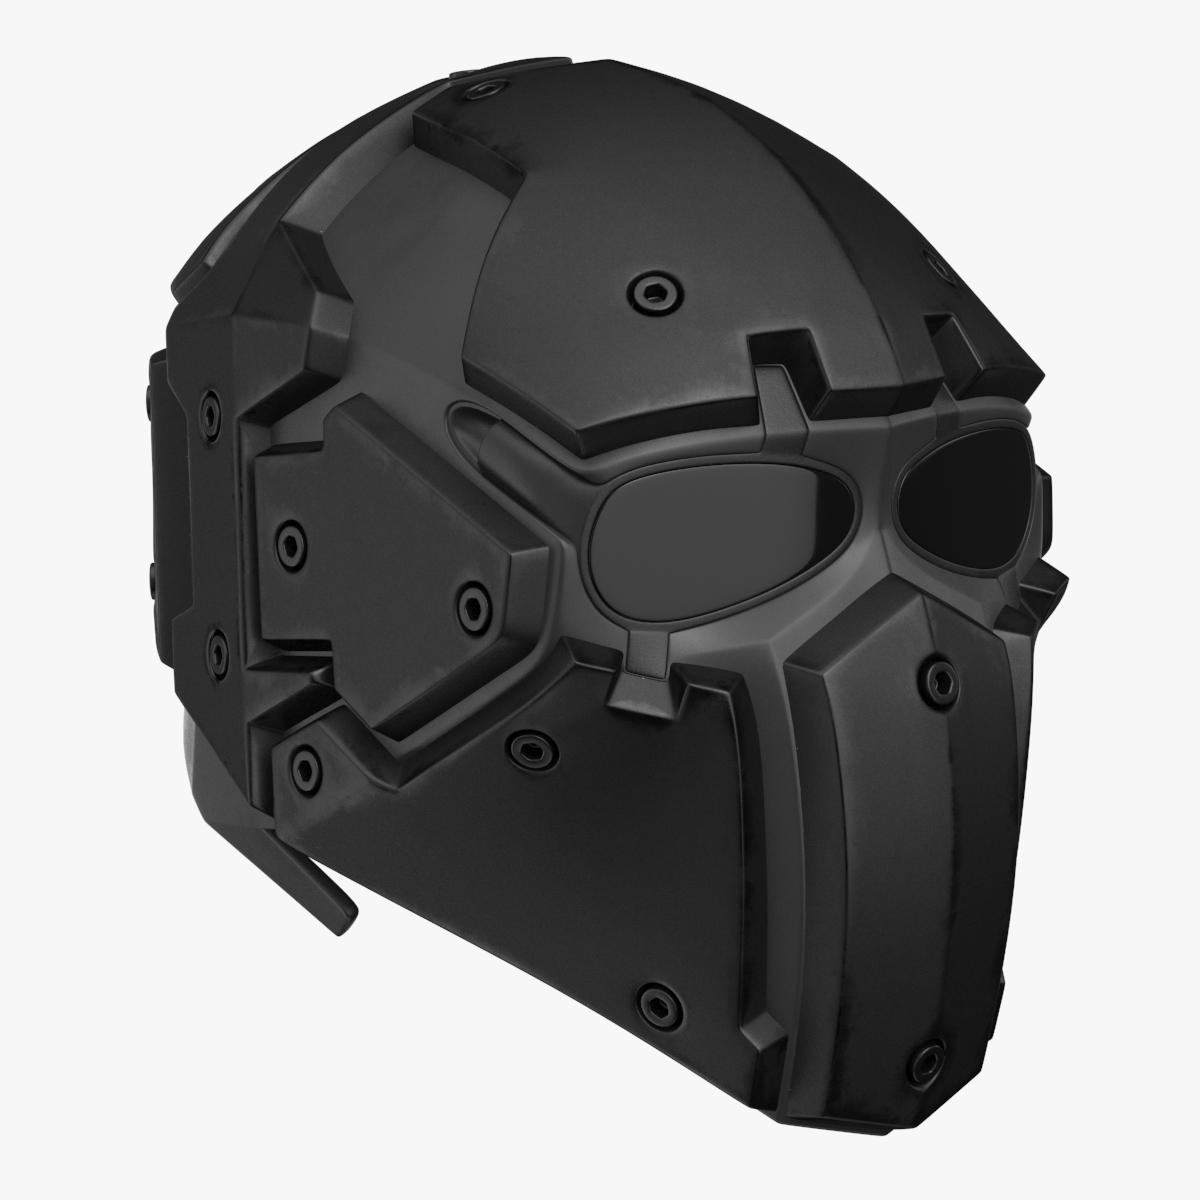 Kevlar Tactical Mask Black 3d Army Armor Military Police Ballistic Combat Head Soldier Glasses War Special Force Pbr Tactical Helmet Ballistic Mask Tactical